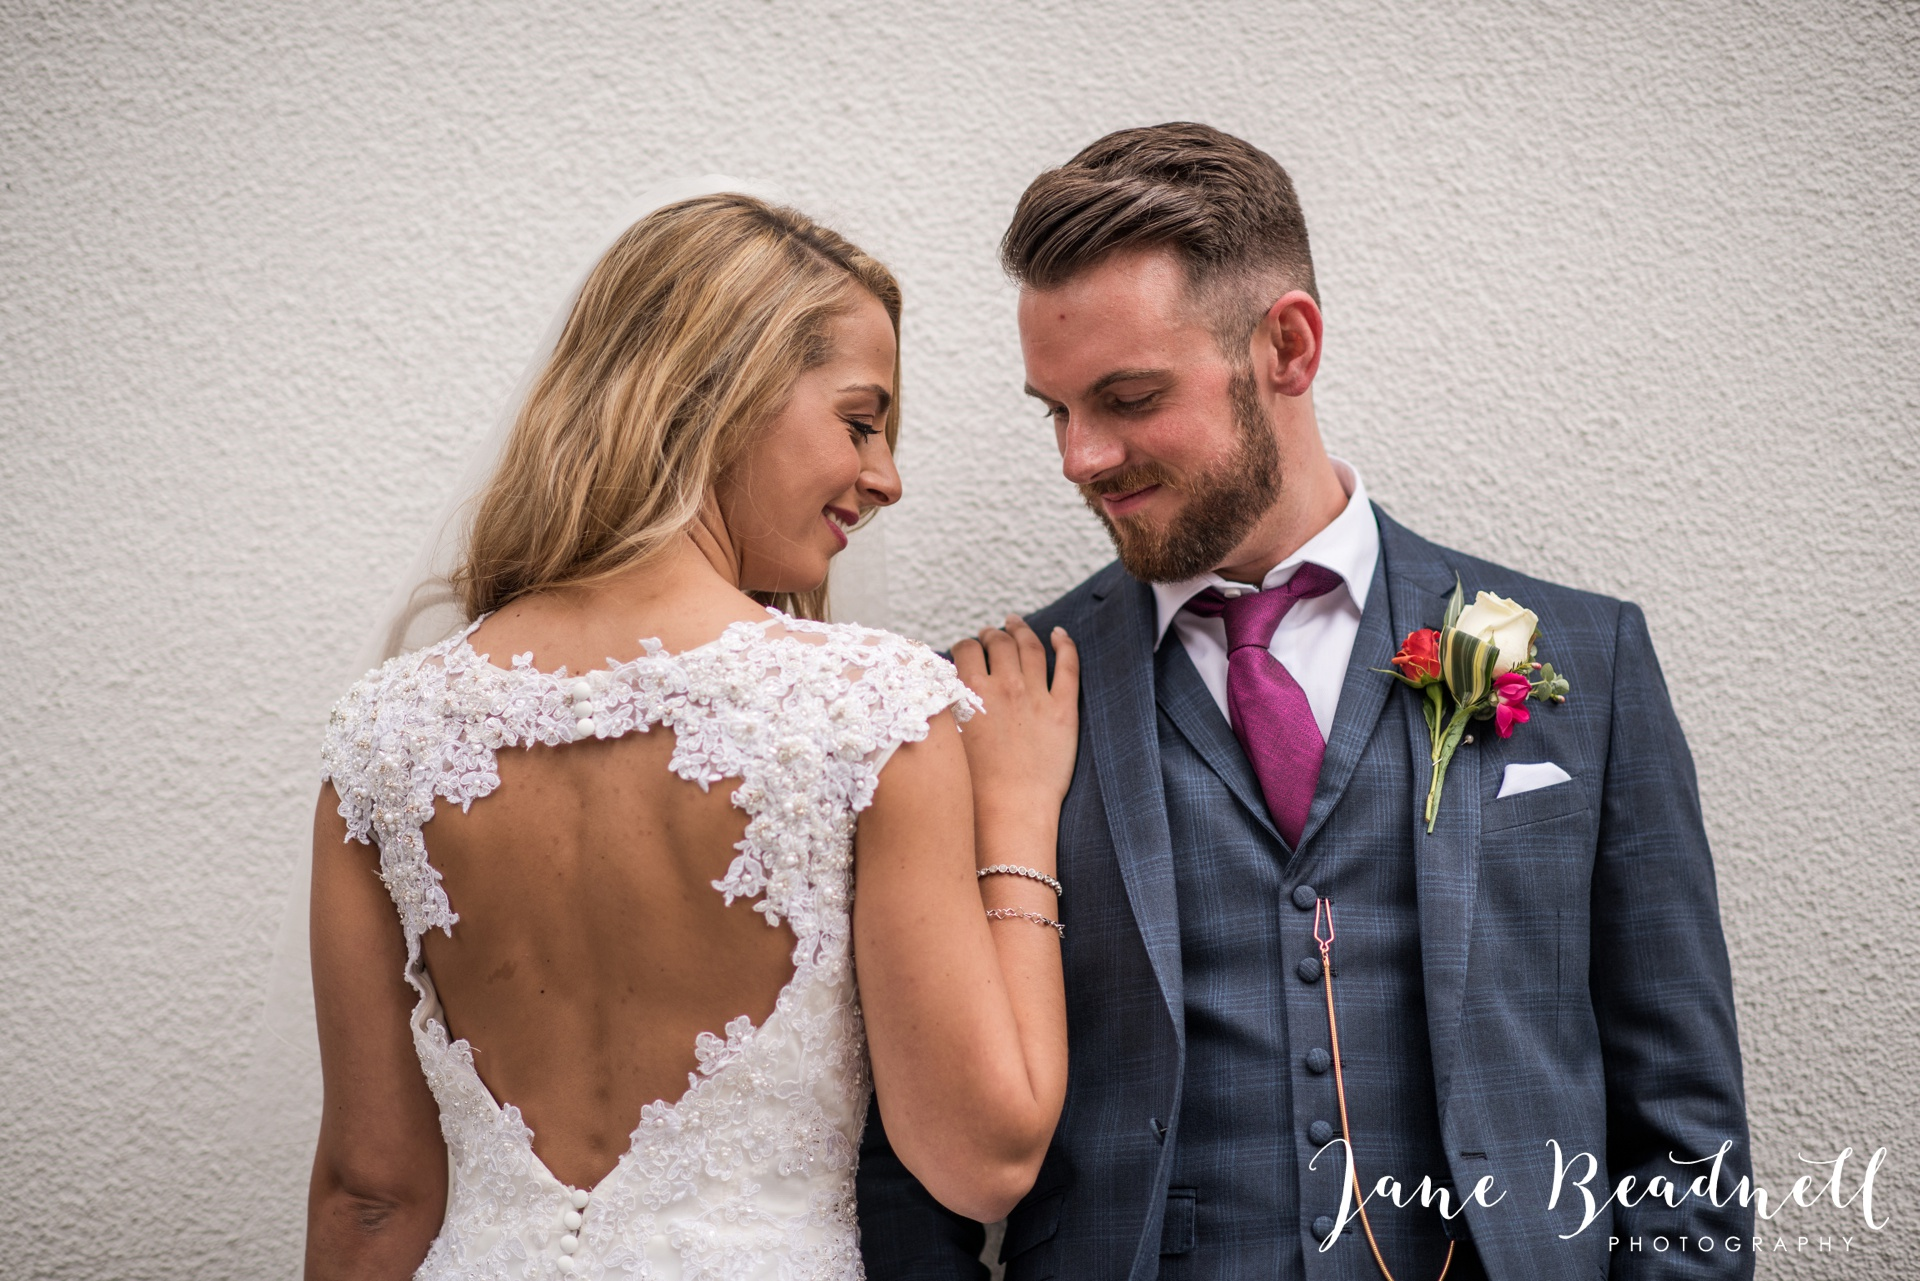 Jane Beadnell fine art wedding photographer Harrogate_0015